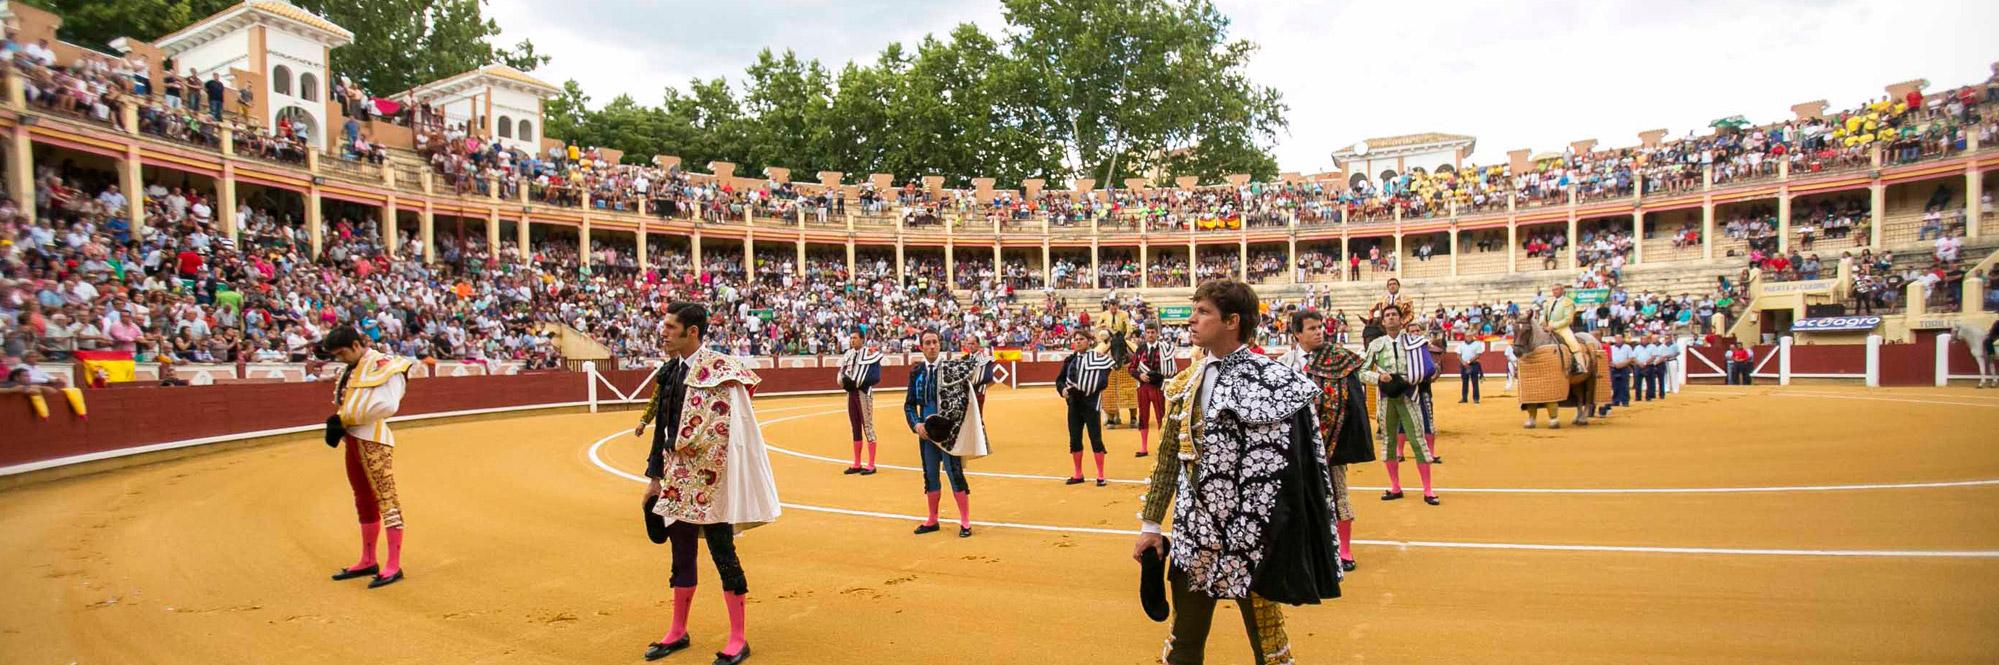 Maxitoro. Feria taurina de San Julián, Cuenca